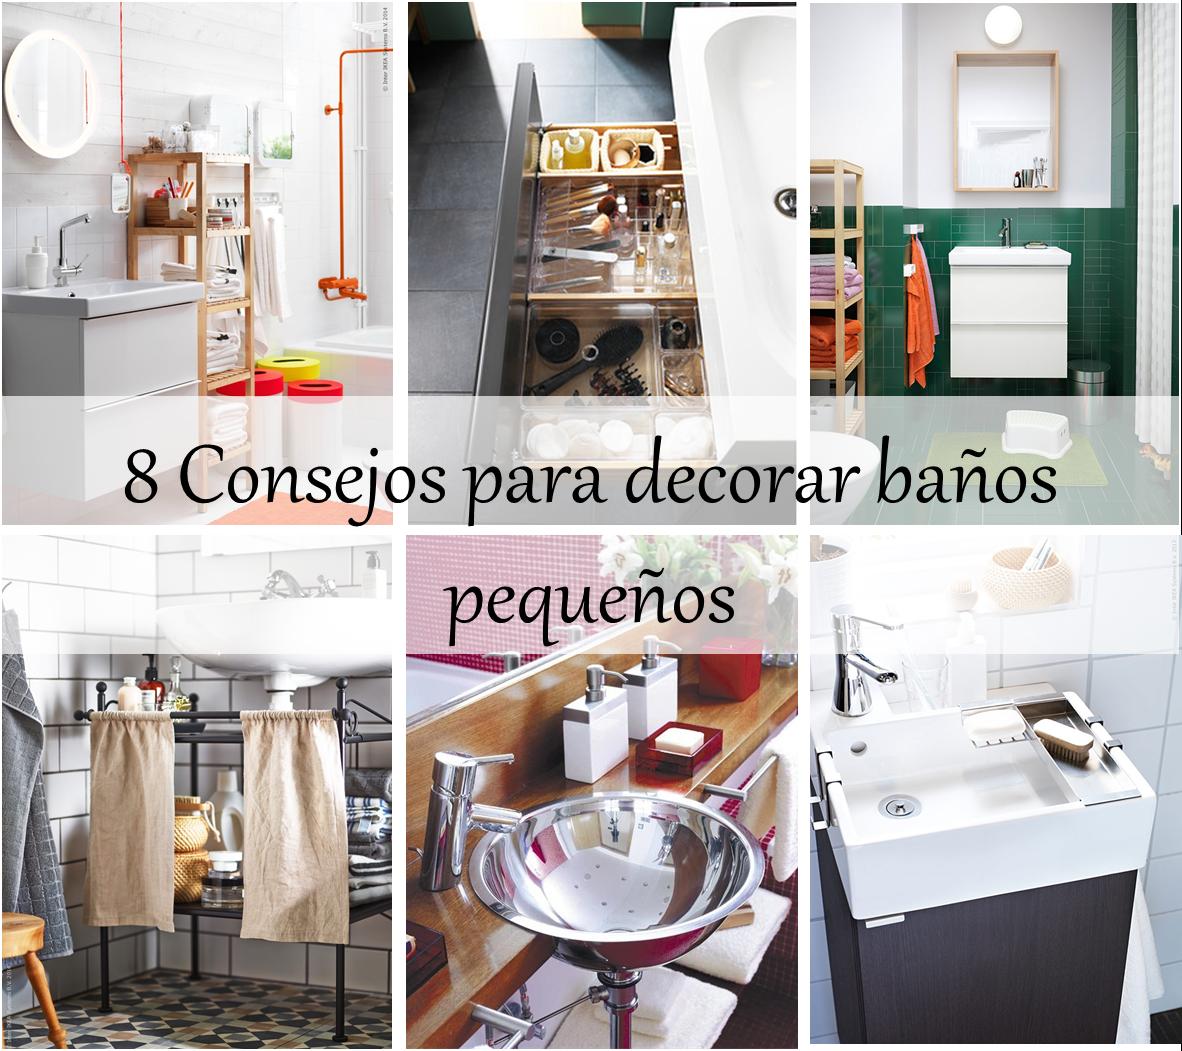 Objetos de decoracion modernos - Objetos decoracion cocina ...